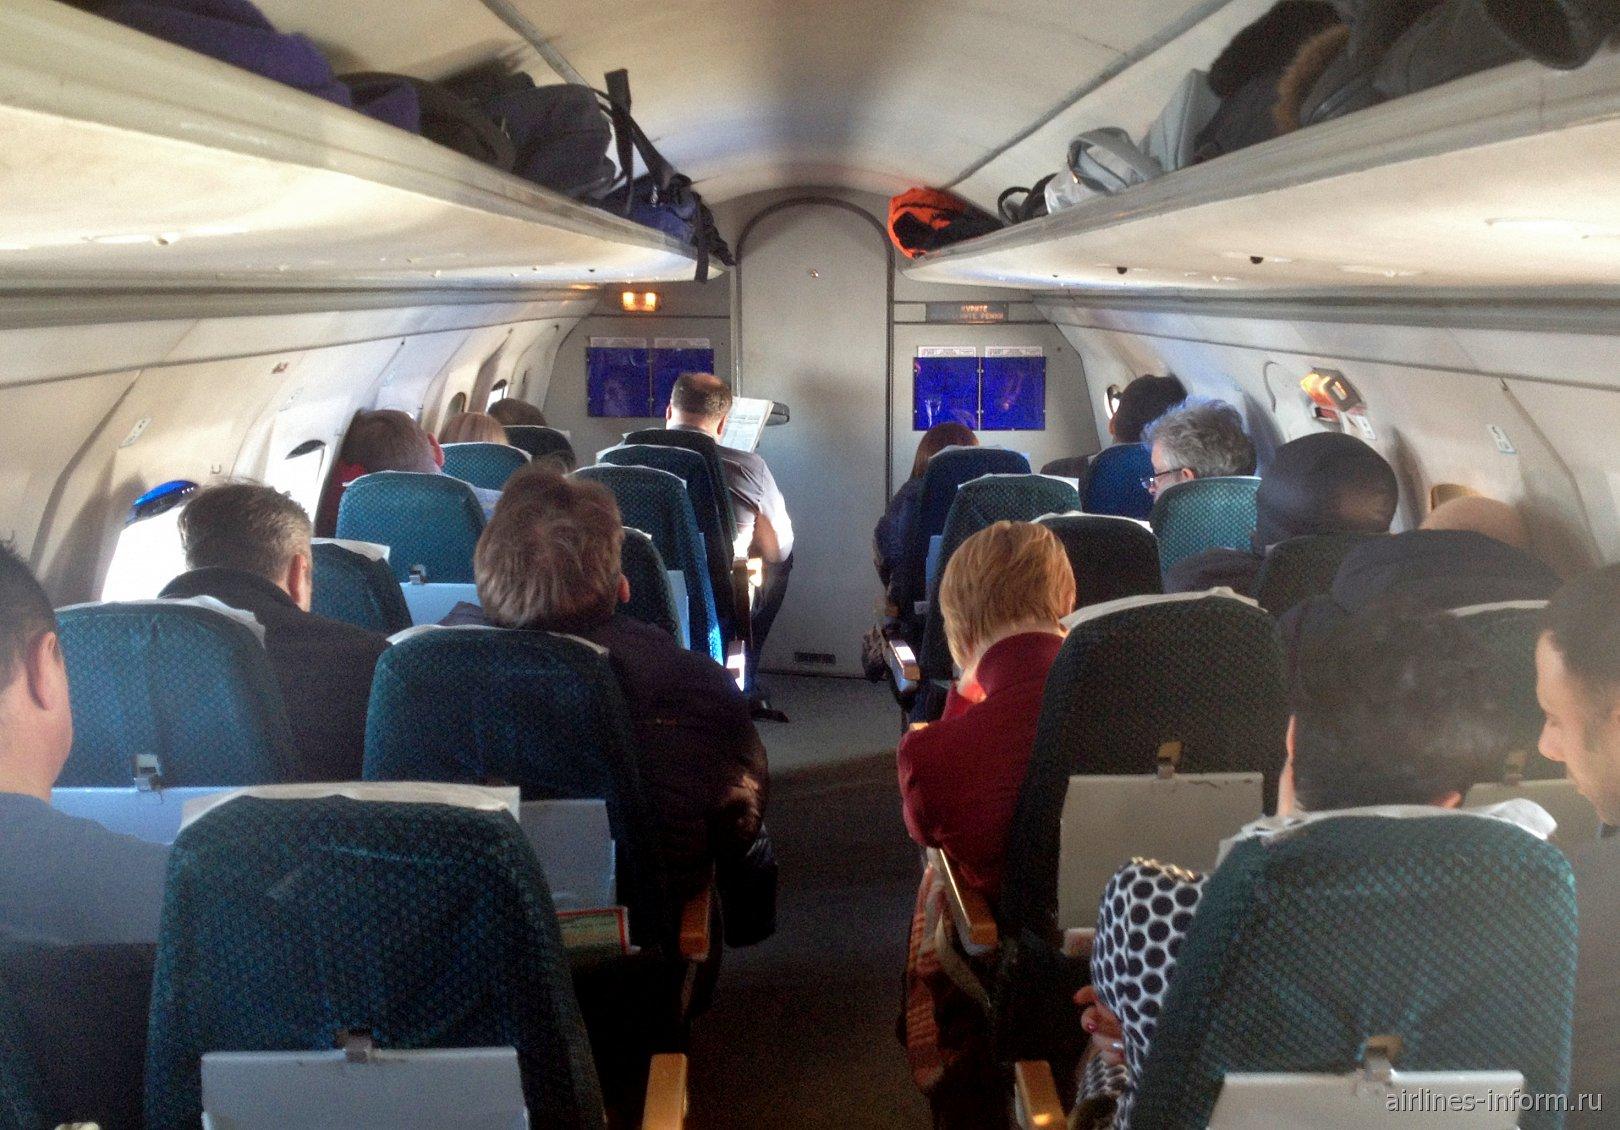 Пассажирский салон самолета Як-40 Вологодского авиапредприятия